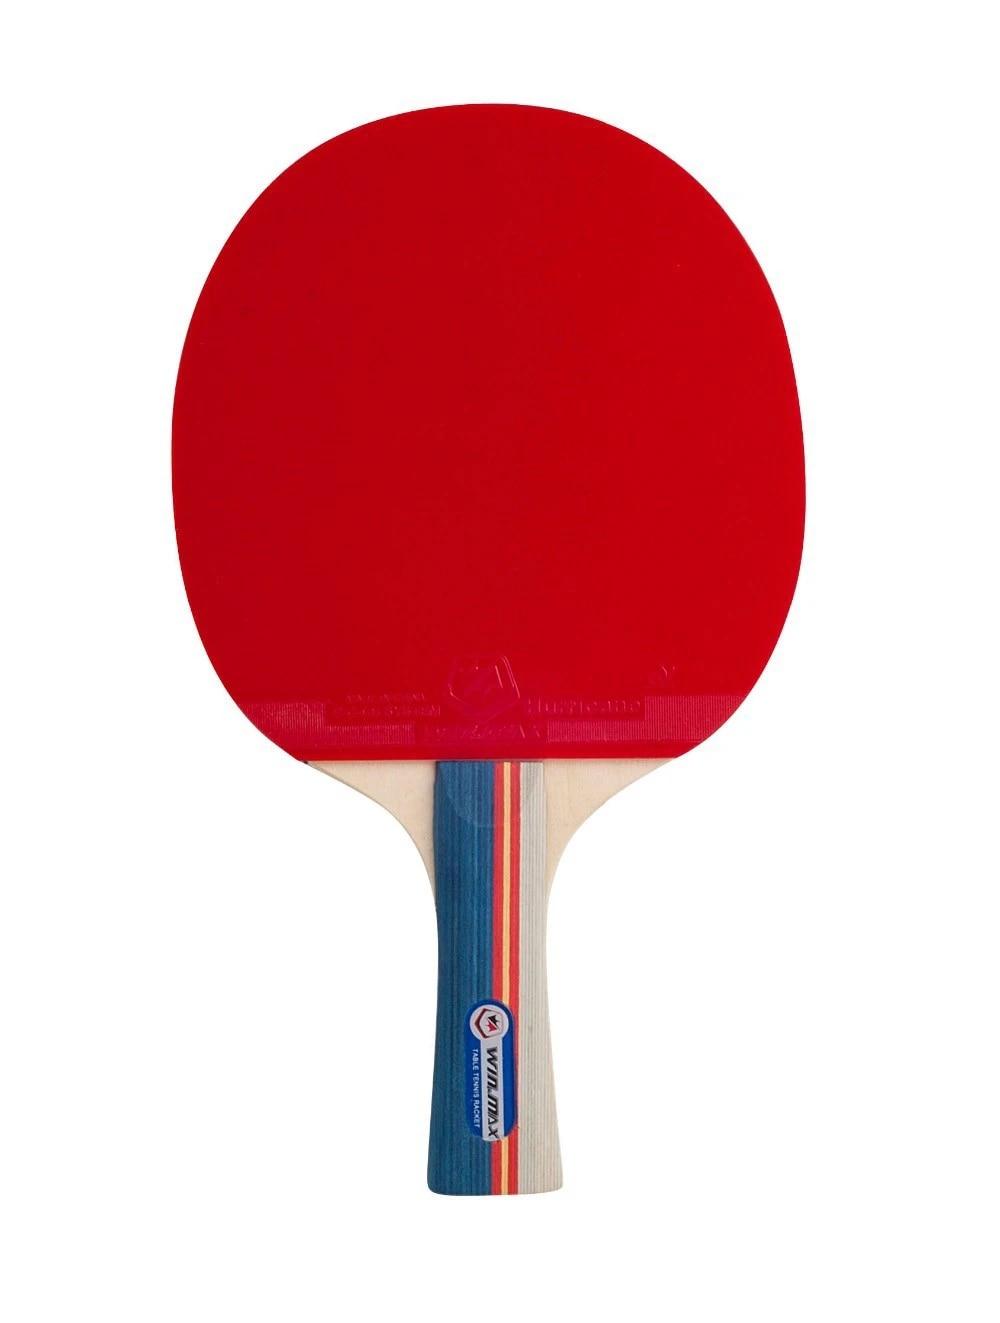 Panjang Tenis Meja : panjang, tenis, Winmax, Berkualitas, Bintang, Panjang, Menangani, Tenis, Raket, Pingpong, Dayung, Peralatan, Olahraga,, Bat|tennis, Bat|table, Tennis, Battable, AliExpress